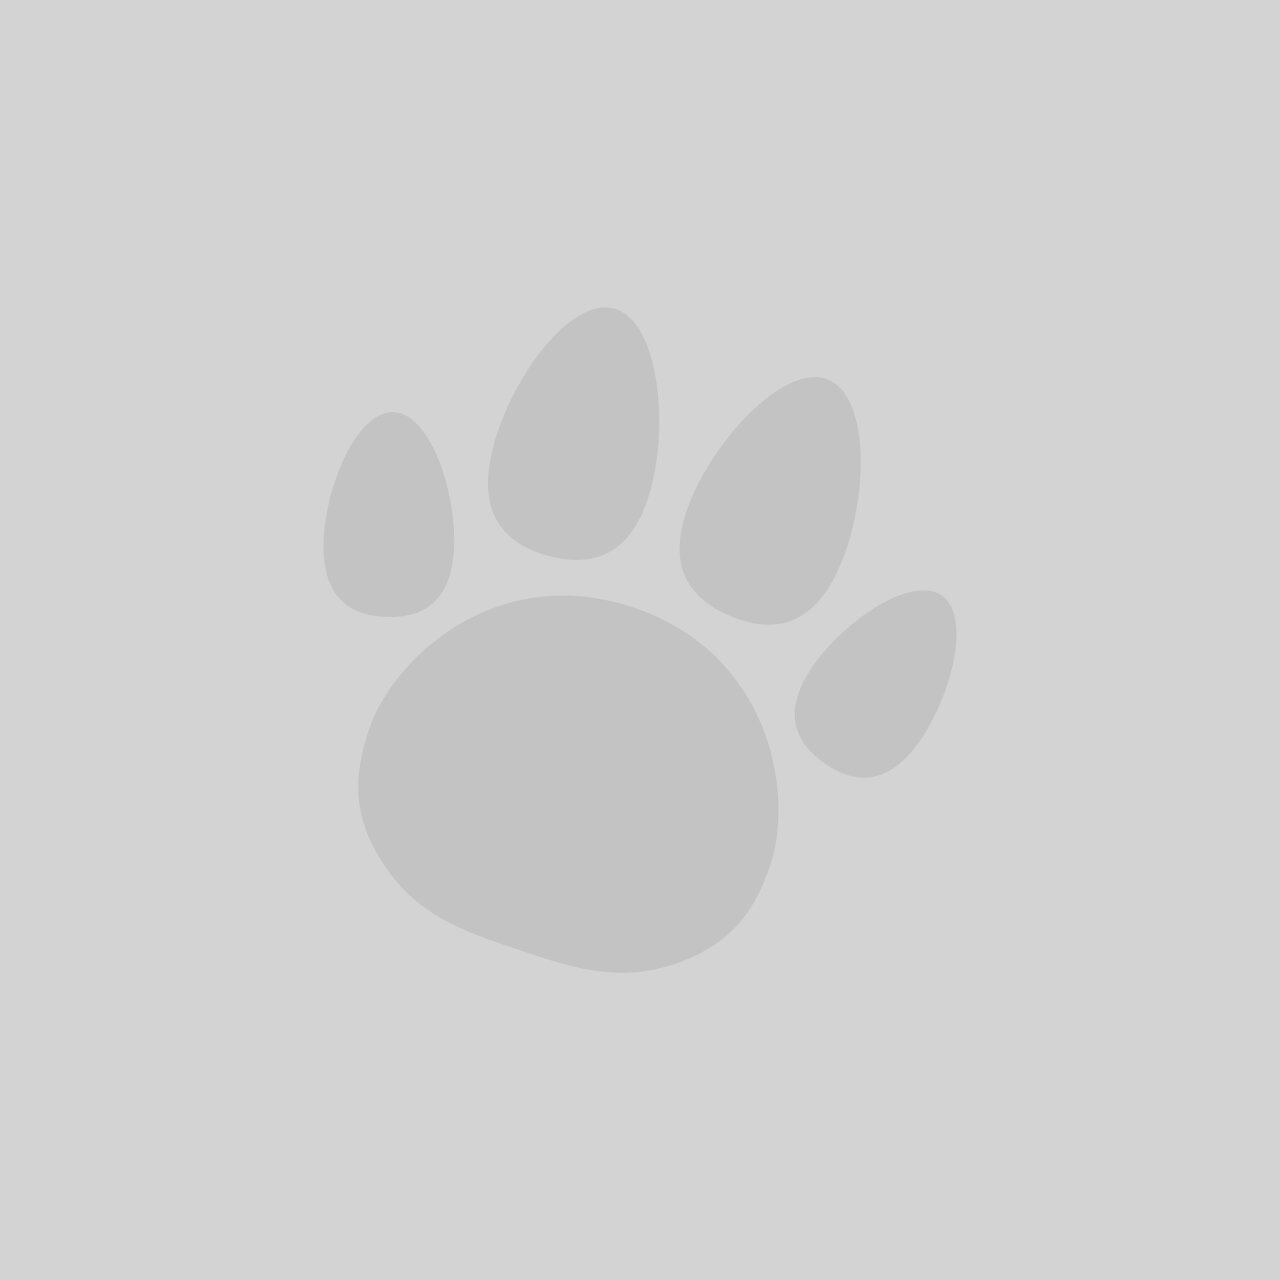 Iams Delights Senior Cat Food with Chicken in Gravy 12x85g